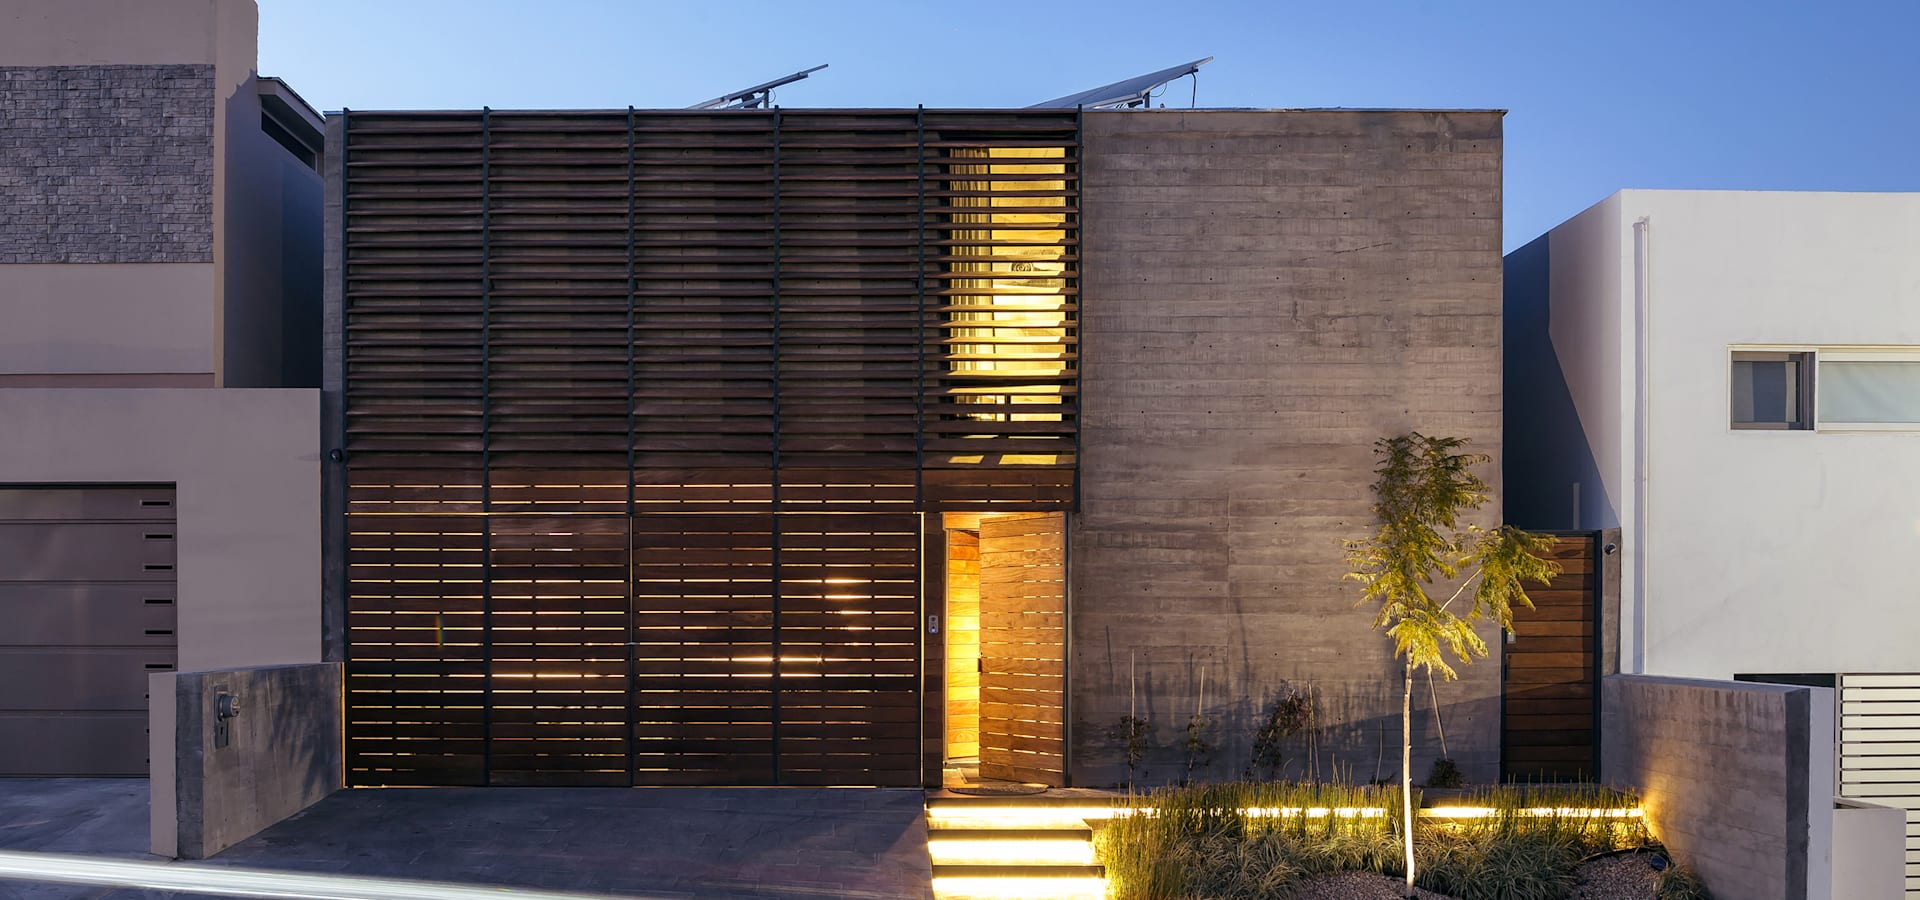 Garza Maya Arquitectos